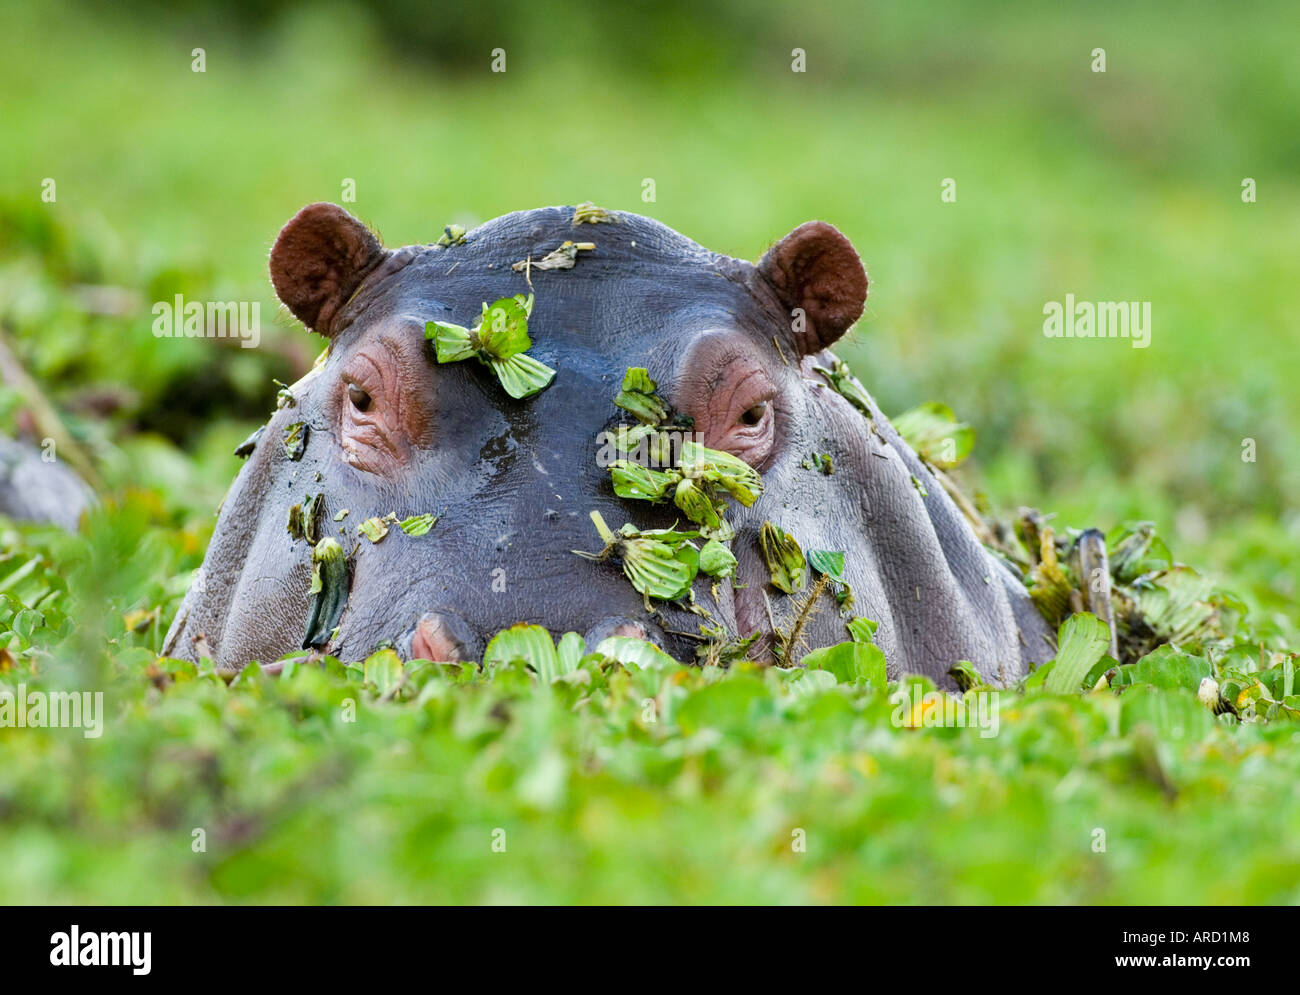 Hippopotame sortant d'une piscine couverte de mauvaises herbes Masai Mara, Kenya Photo Stock